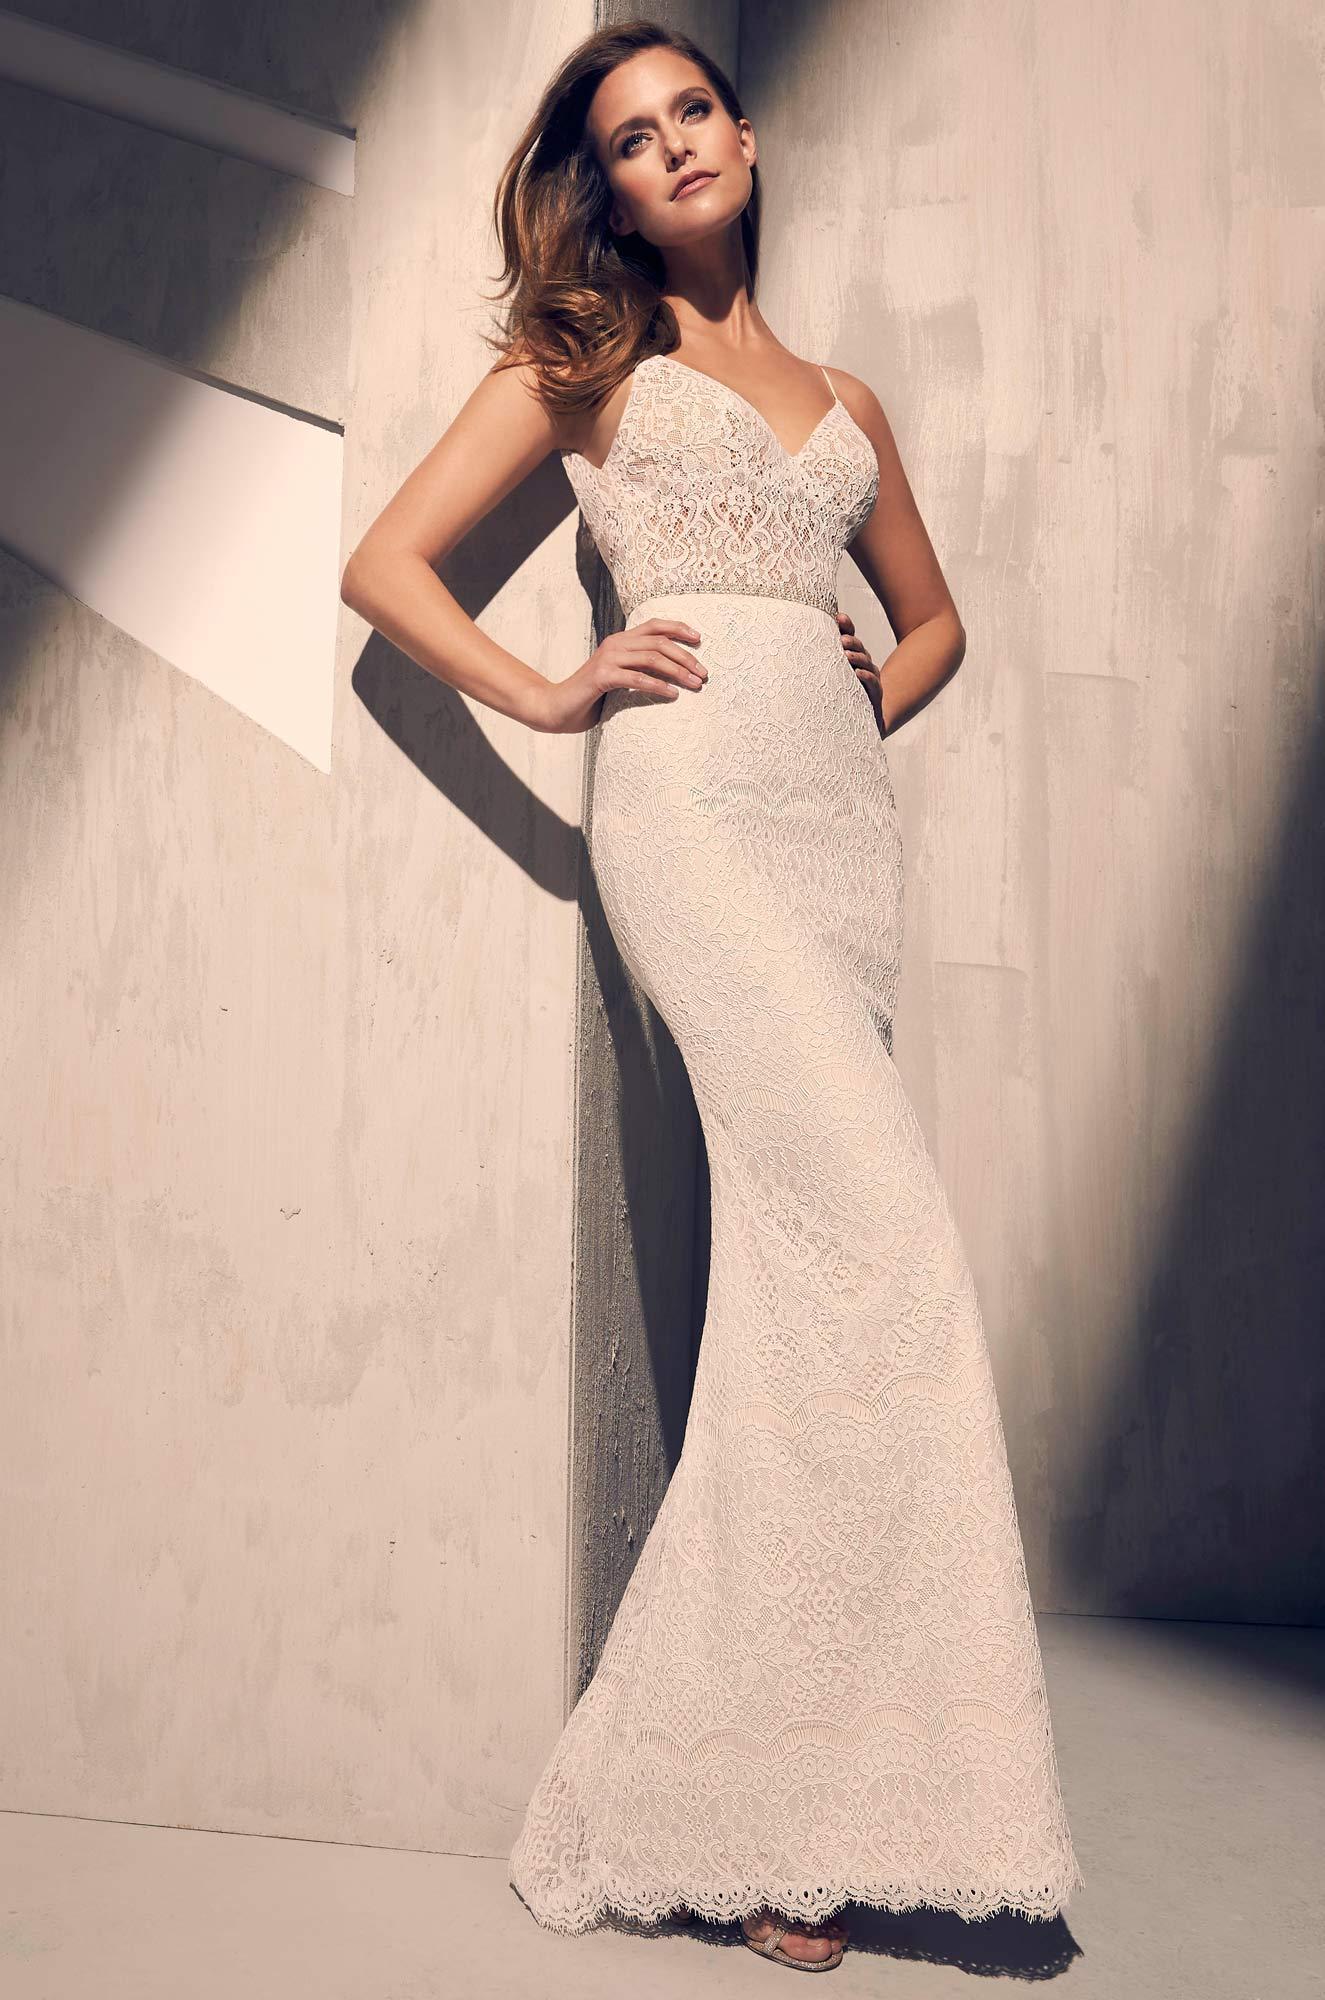 Mira Couture Mikaella 2215 Wedding Dress Bridal Gown Full